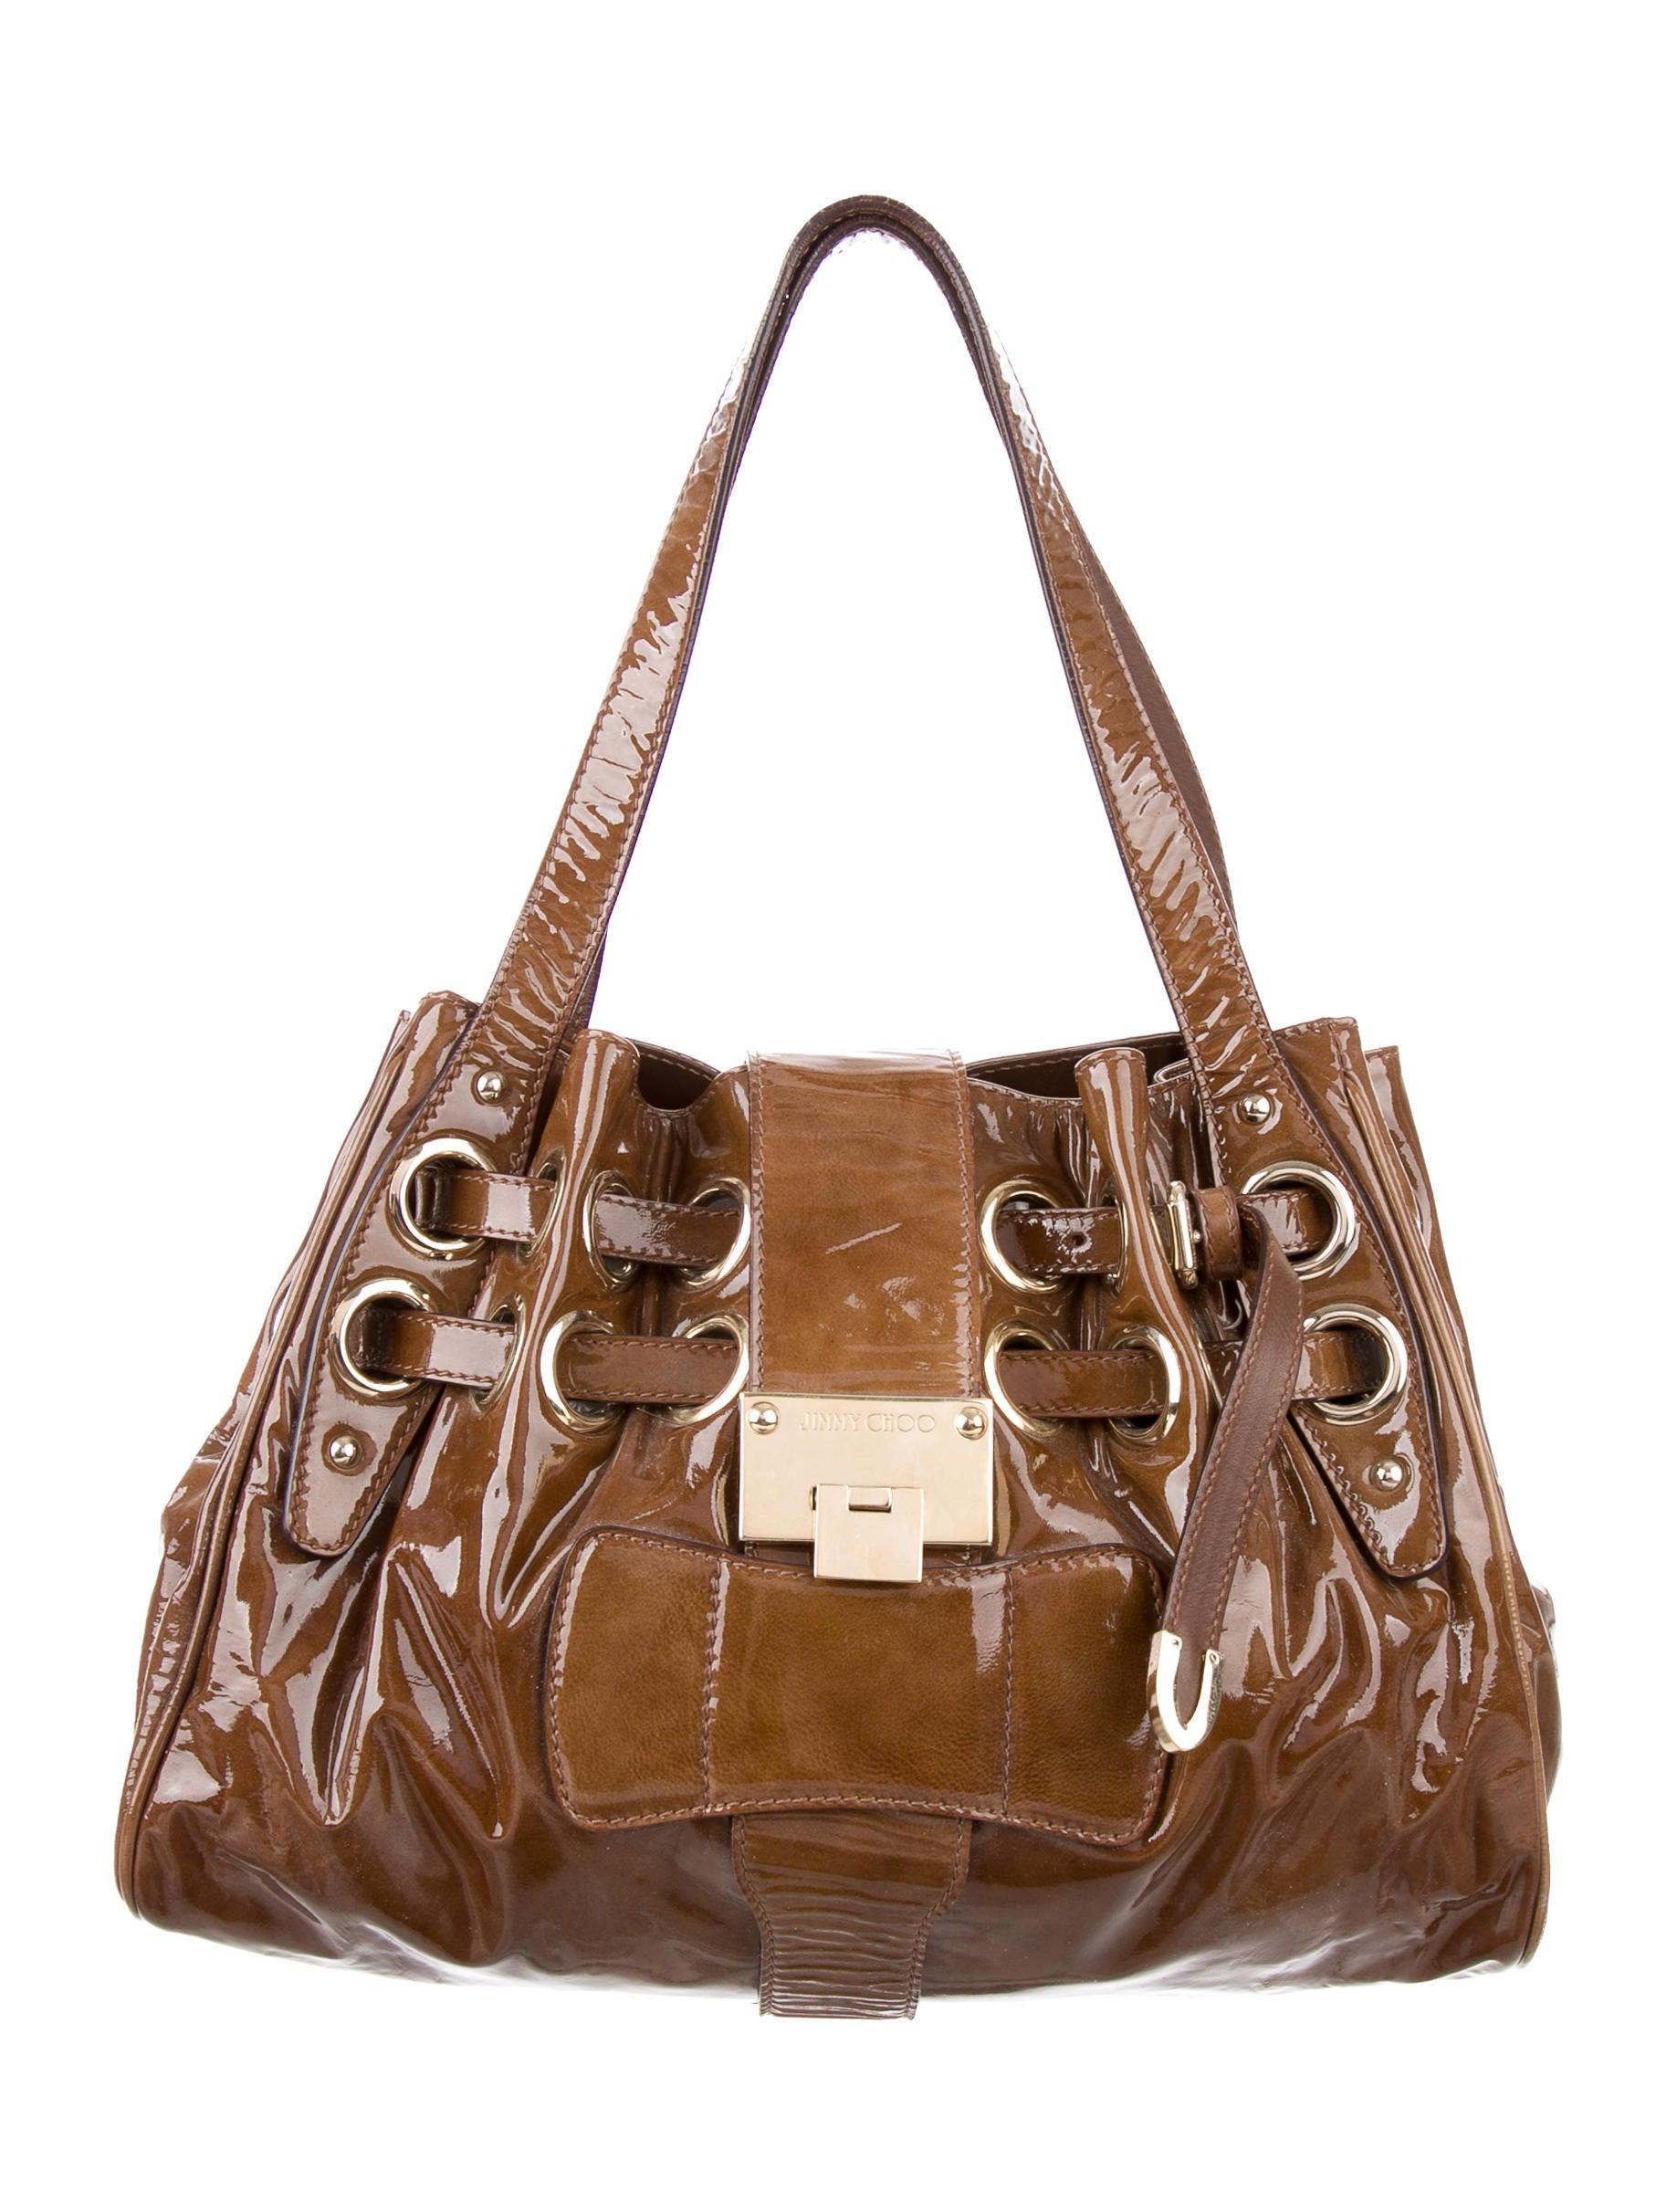 Jimmy Choo Small Ramona Bag - Handbags